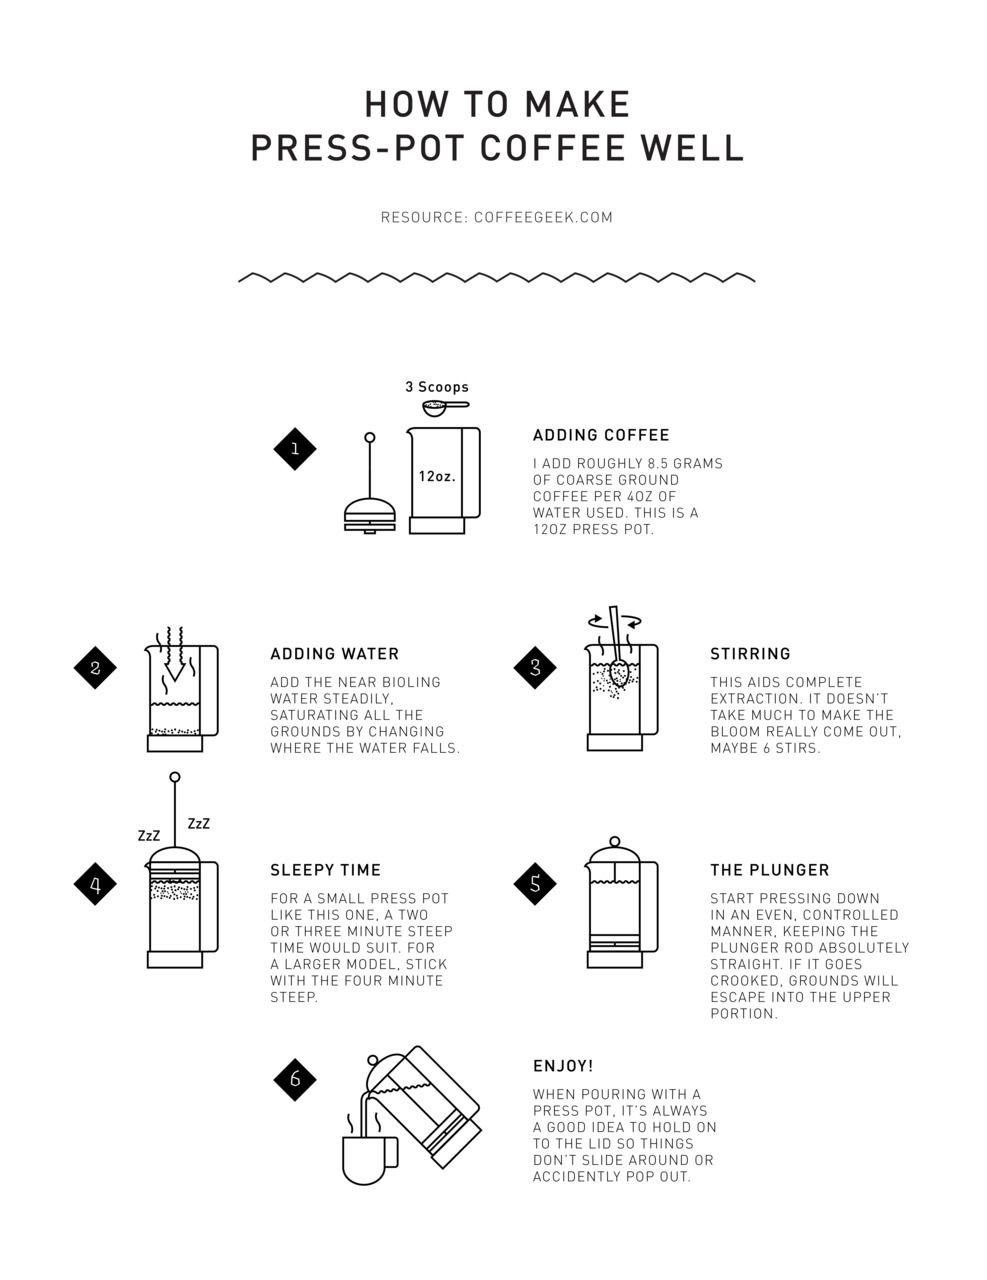 How To Make Press-Pot Coffee Well — Biola Coffee Club